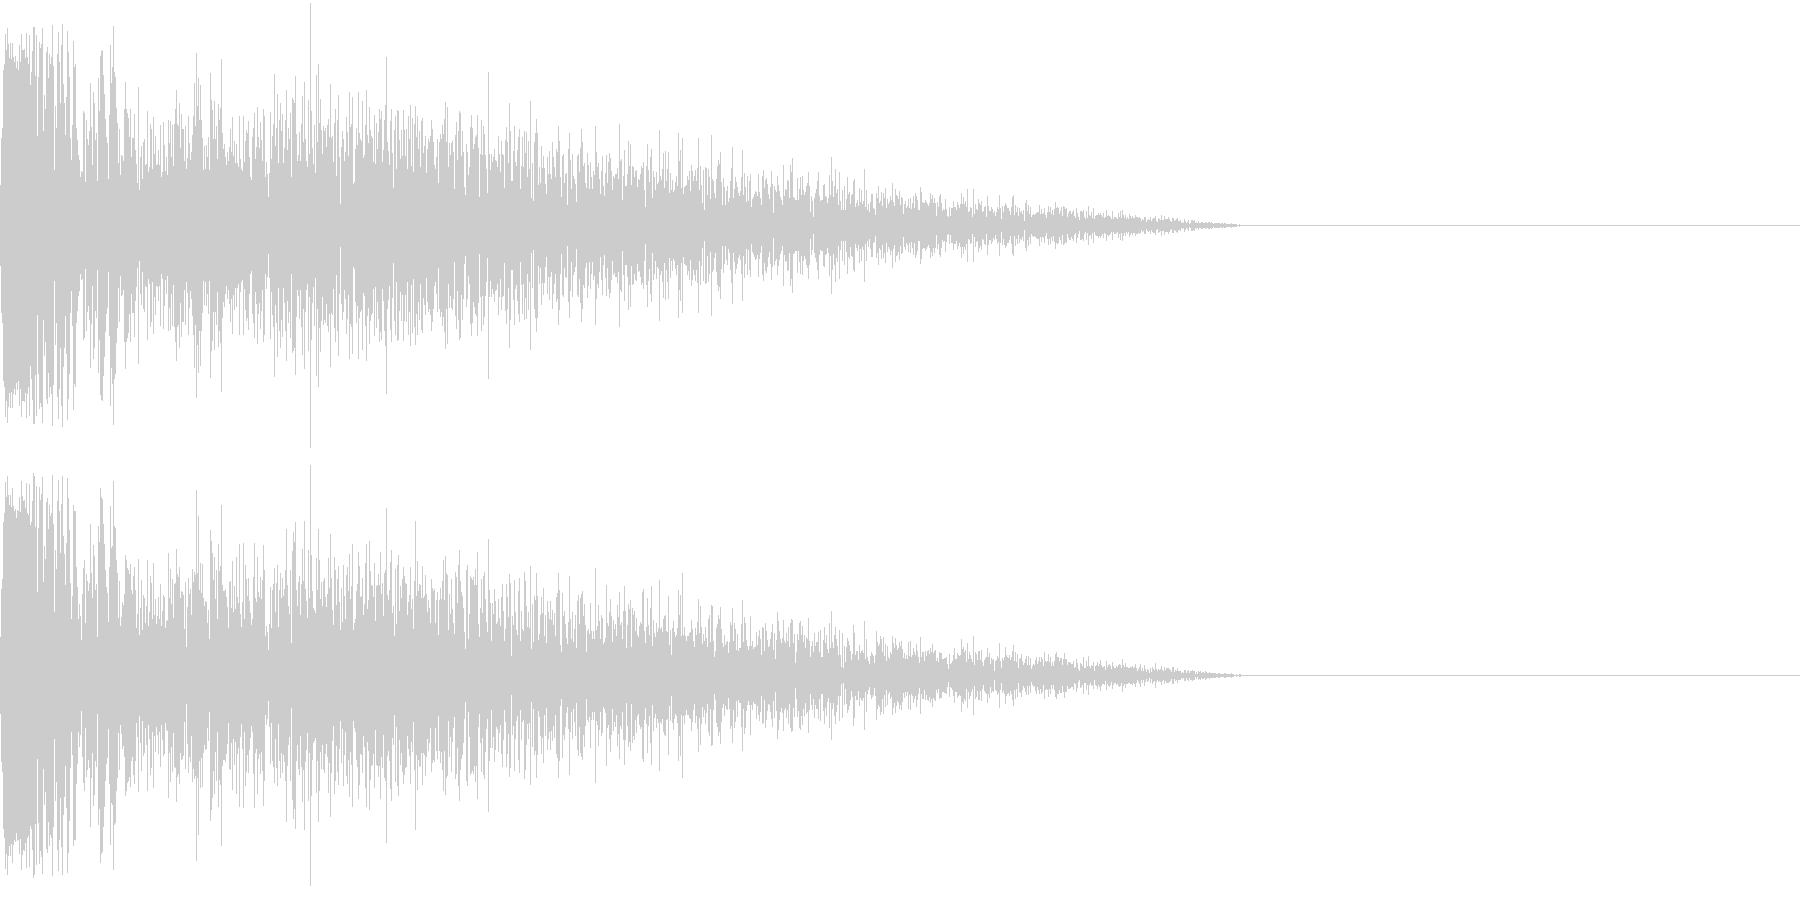 DTM Snare 5 オリジナル音源の未再生の波形